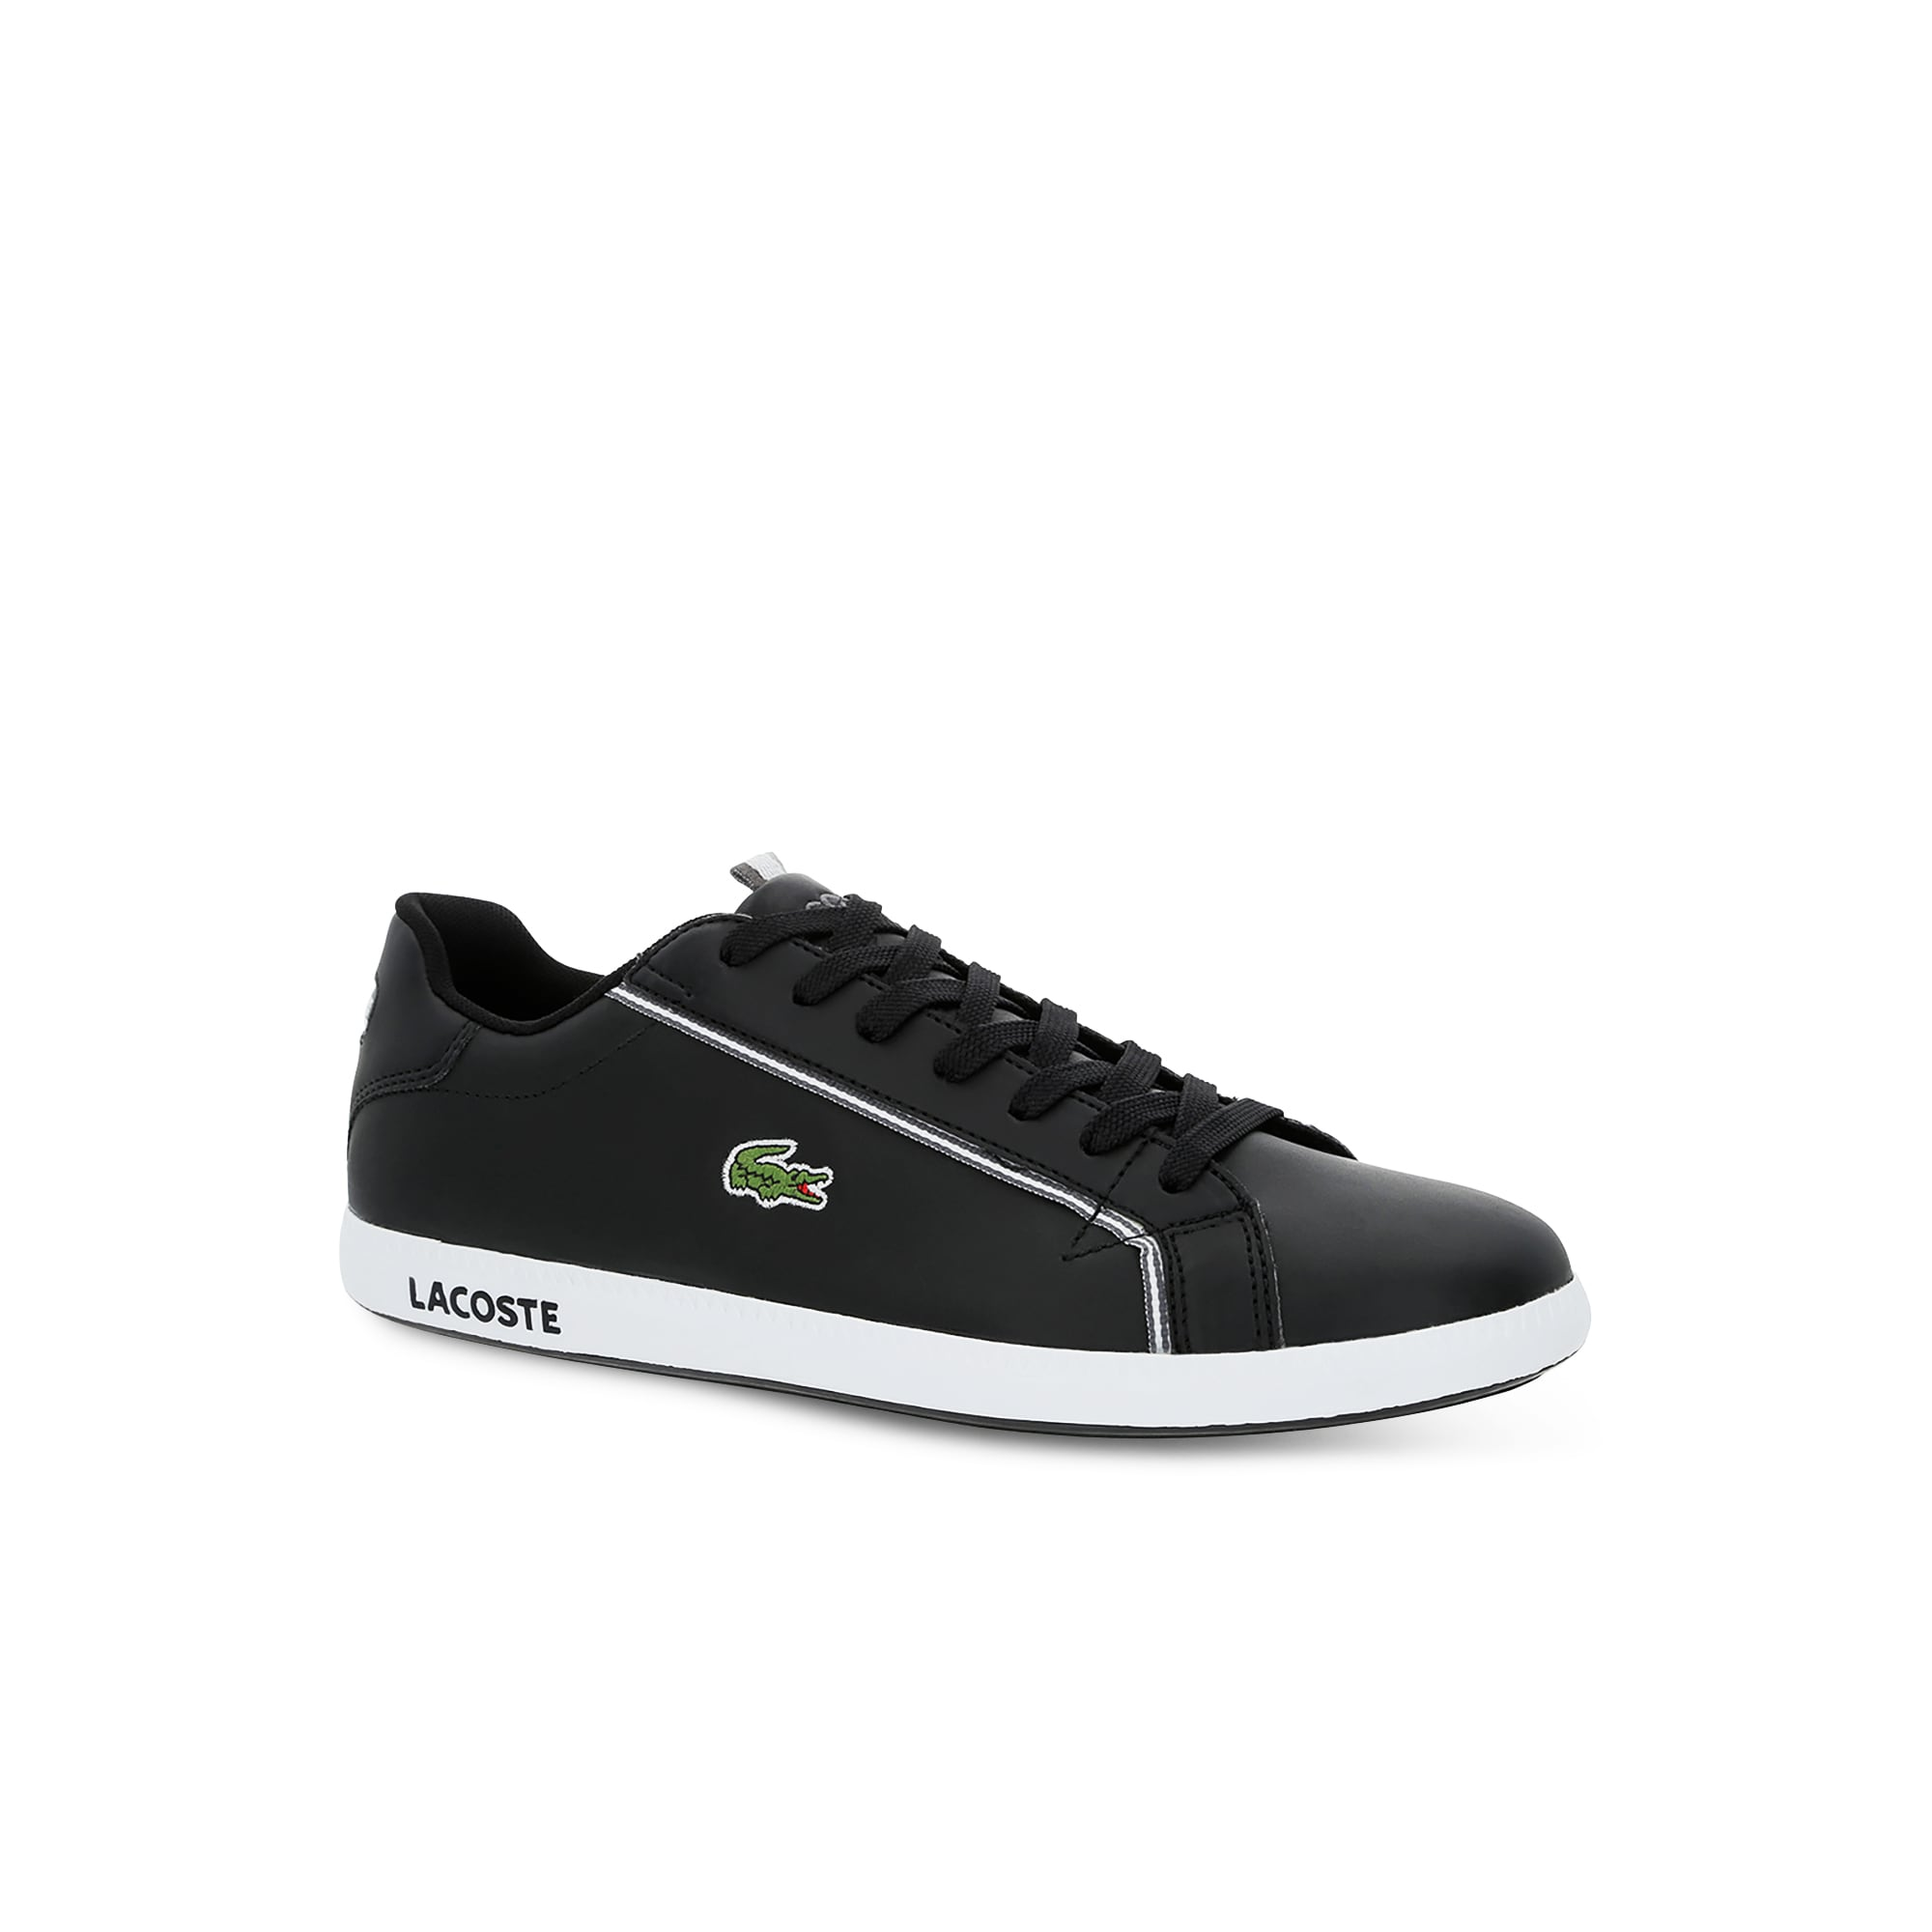 Lacoste Et Baskets Homme Chaussures Sneakers Homme aq0XRnx